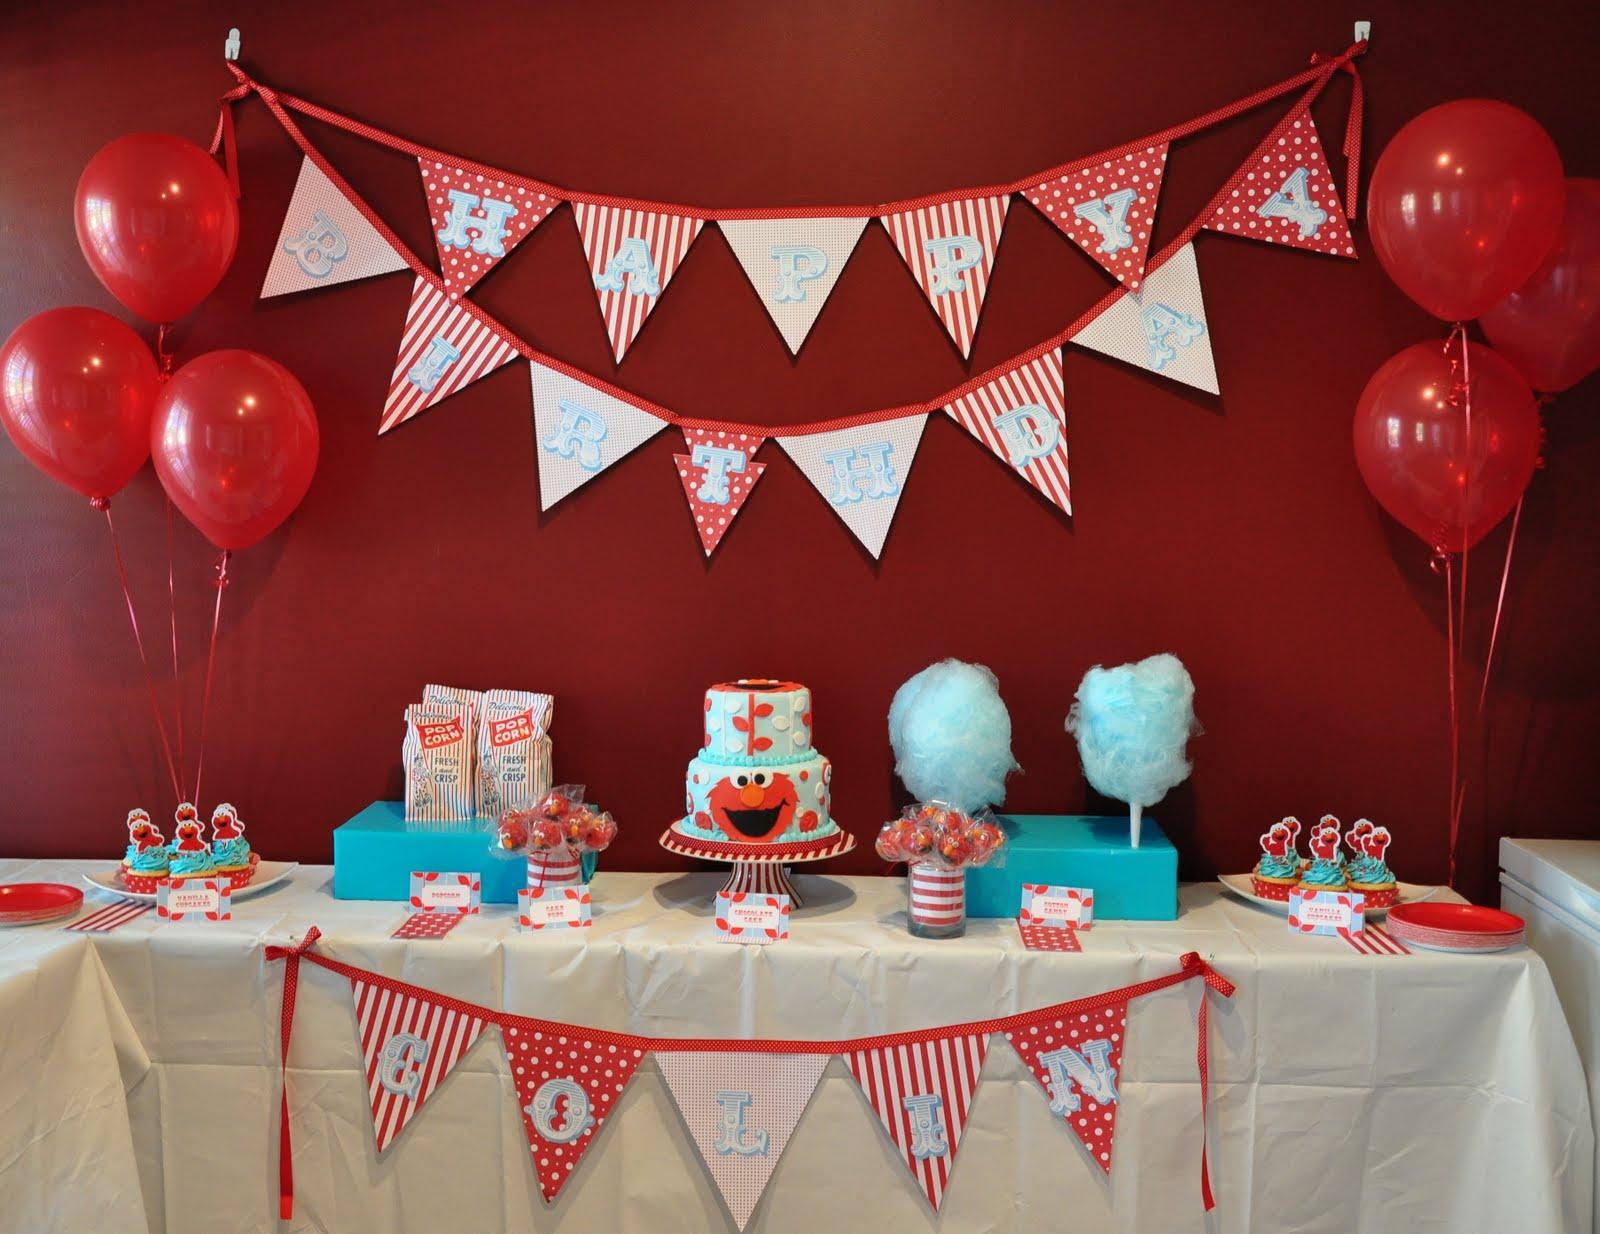 Elmo birthday party decorations ideas memes